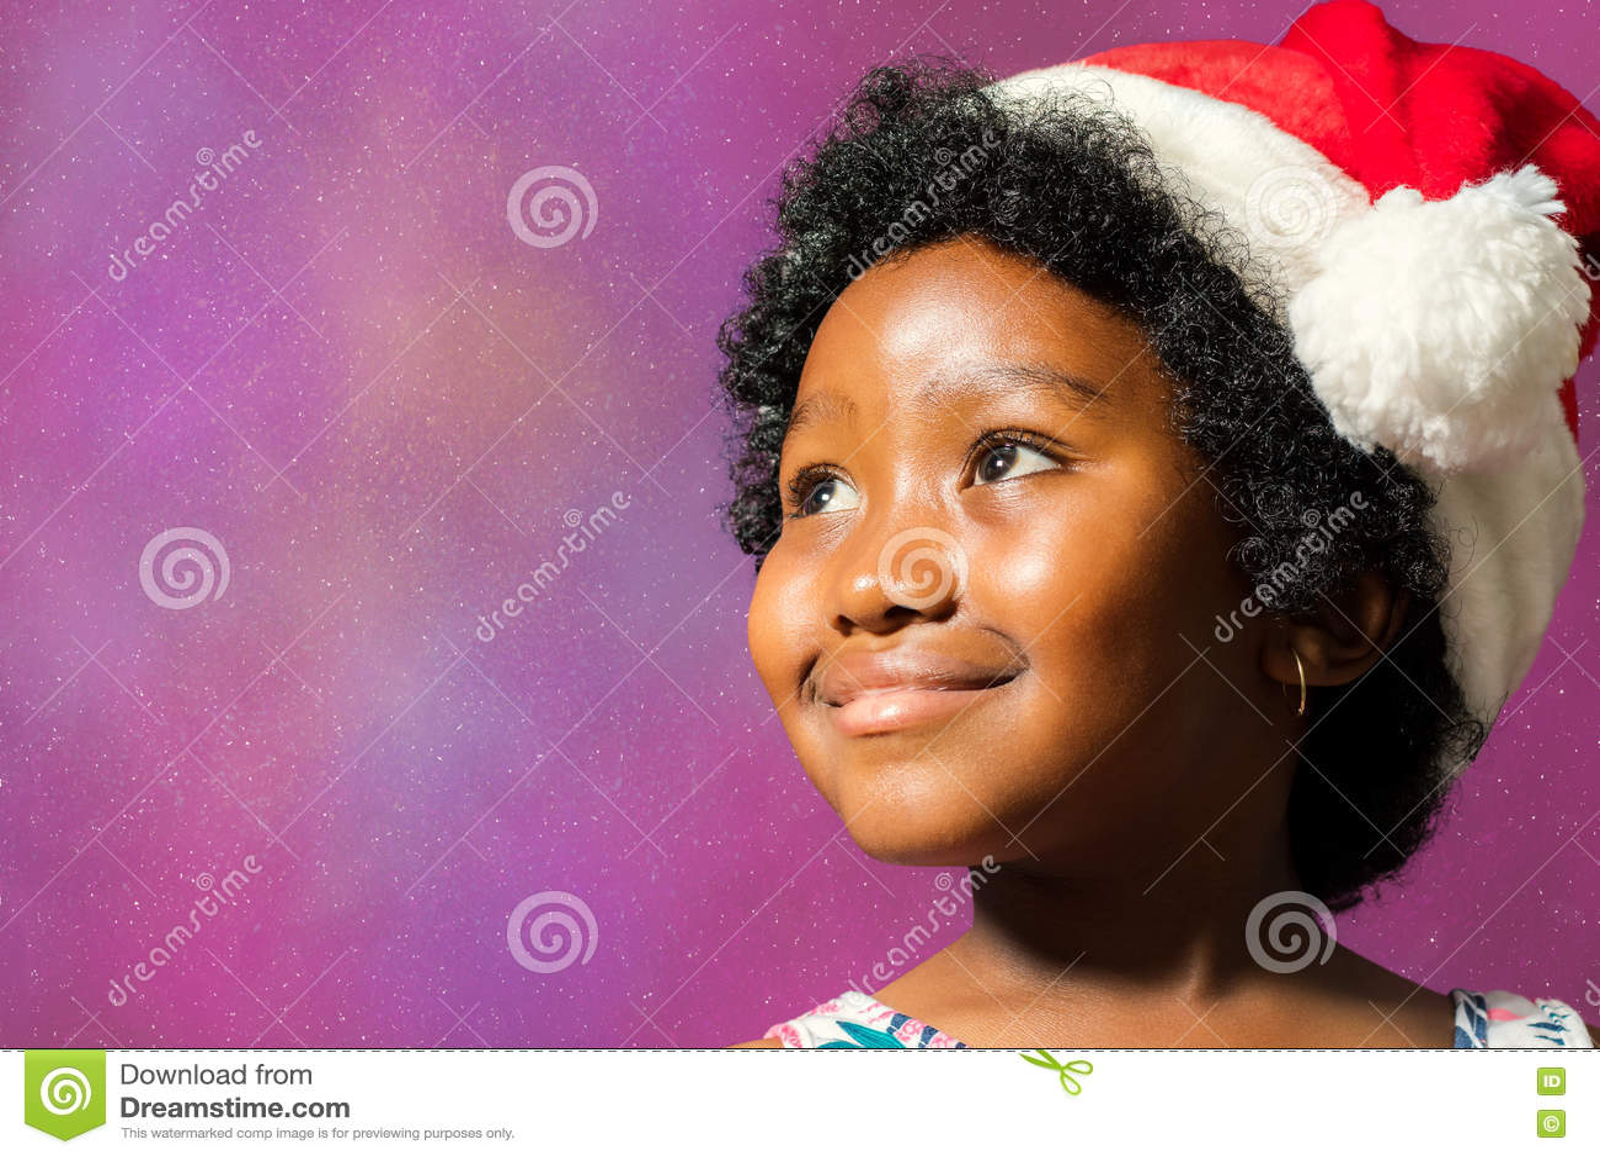 Christmas Hairstyles For Black Girls.Black Girl Wearing Christmas Hat Looking At Corner Stock